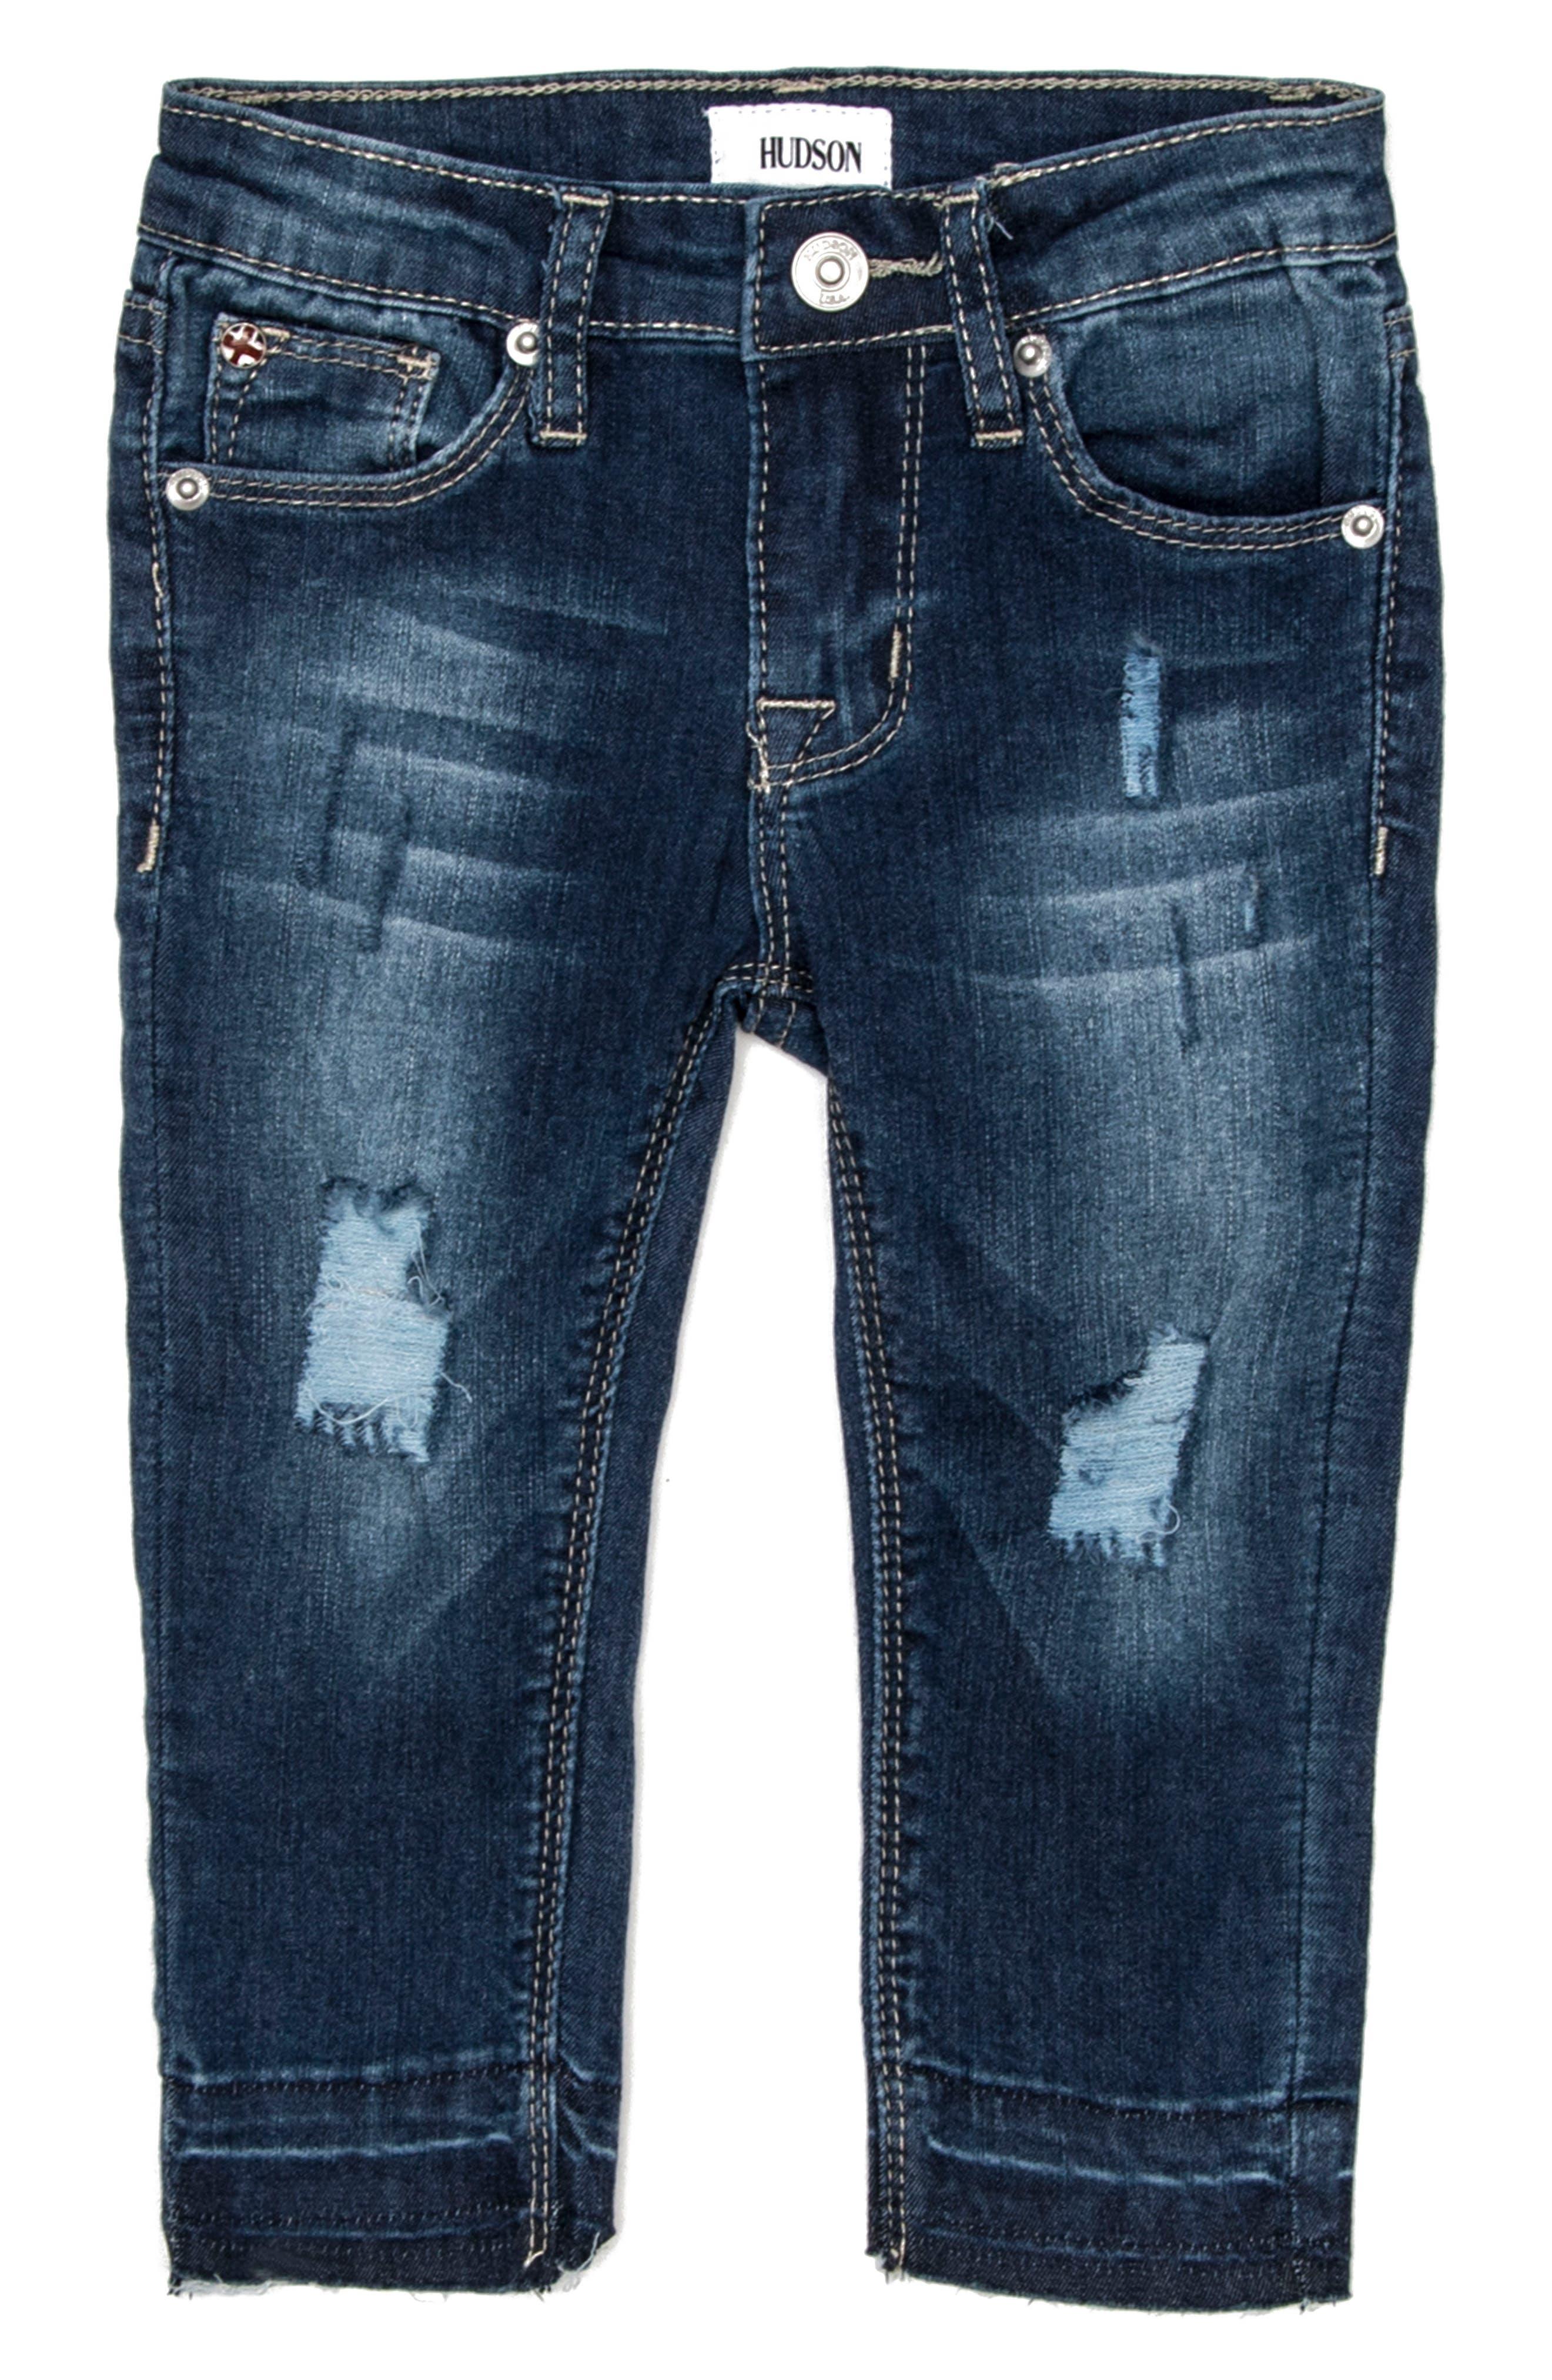 Alternate Image 1 Selected - Hudson Kids Christa Super Stretch Skinny Jeans (Baby Girls)